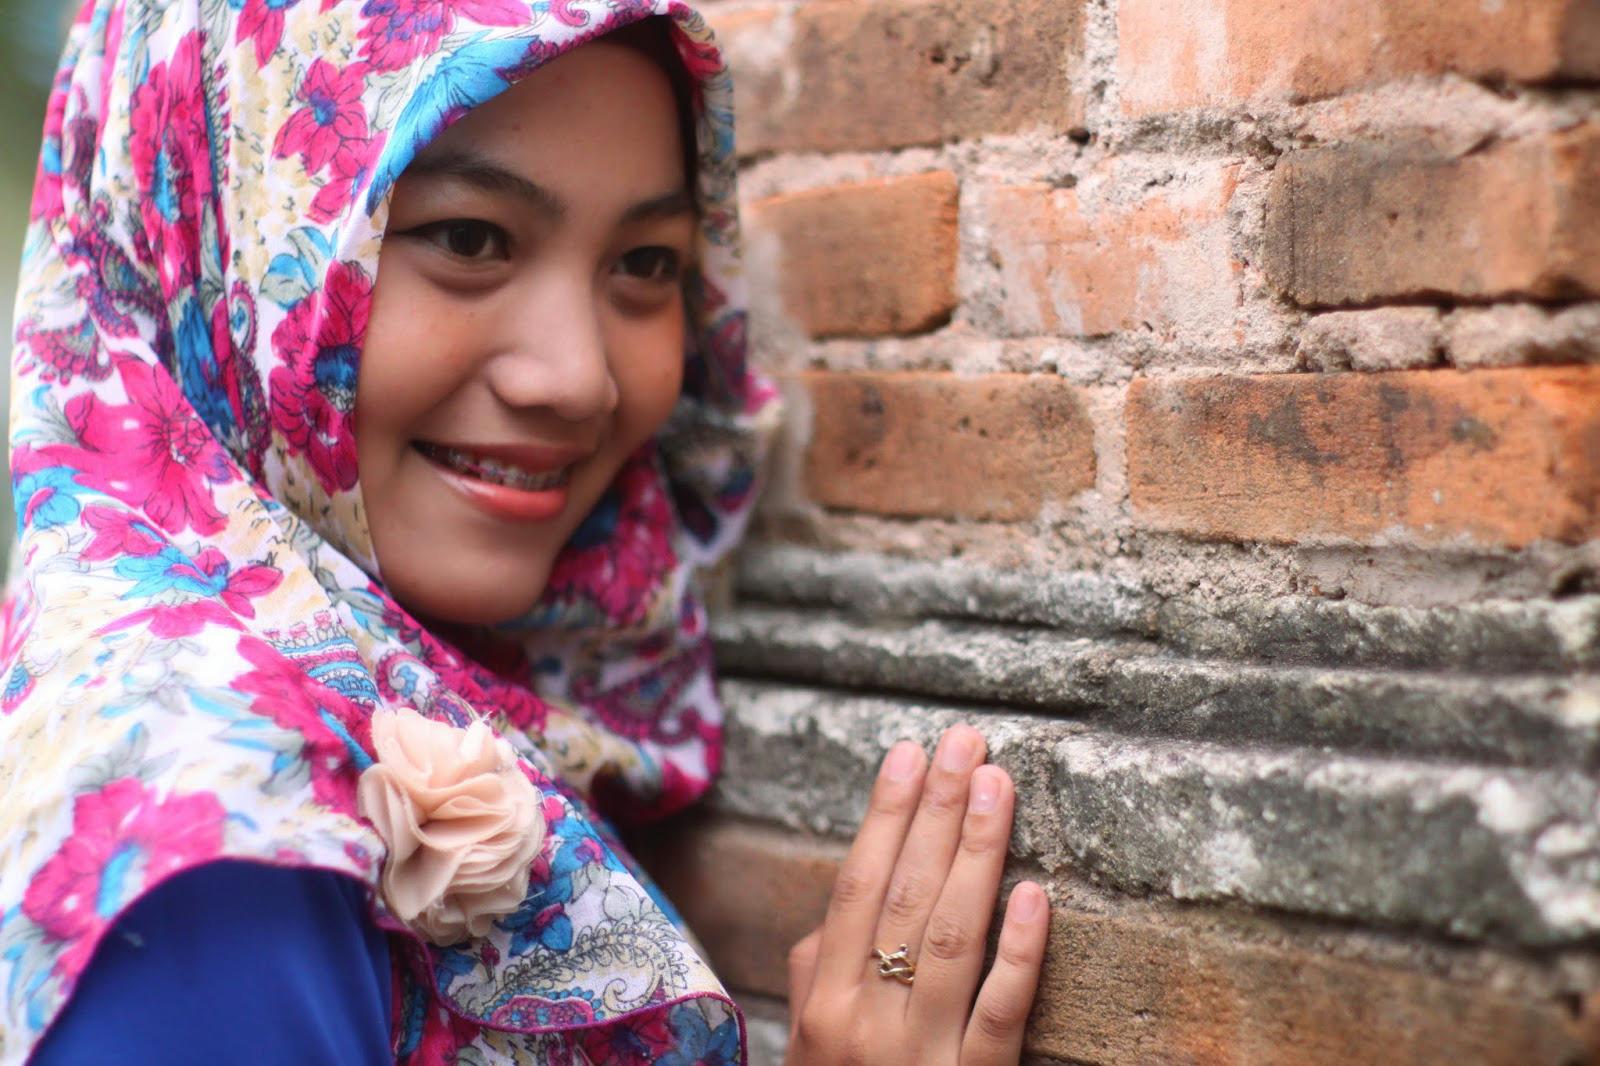 hijab Cewek IGO Efrida Yantizone7 7 gaya hijab Cewek IGO Efrida Yanti